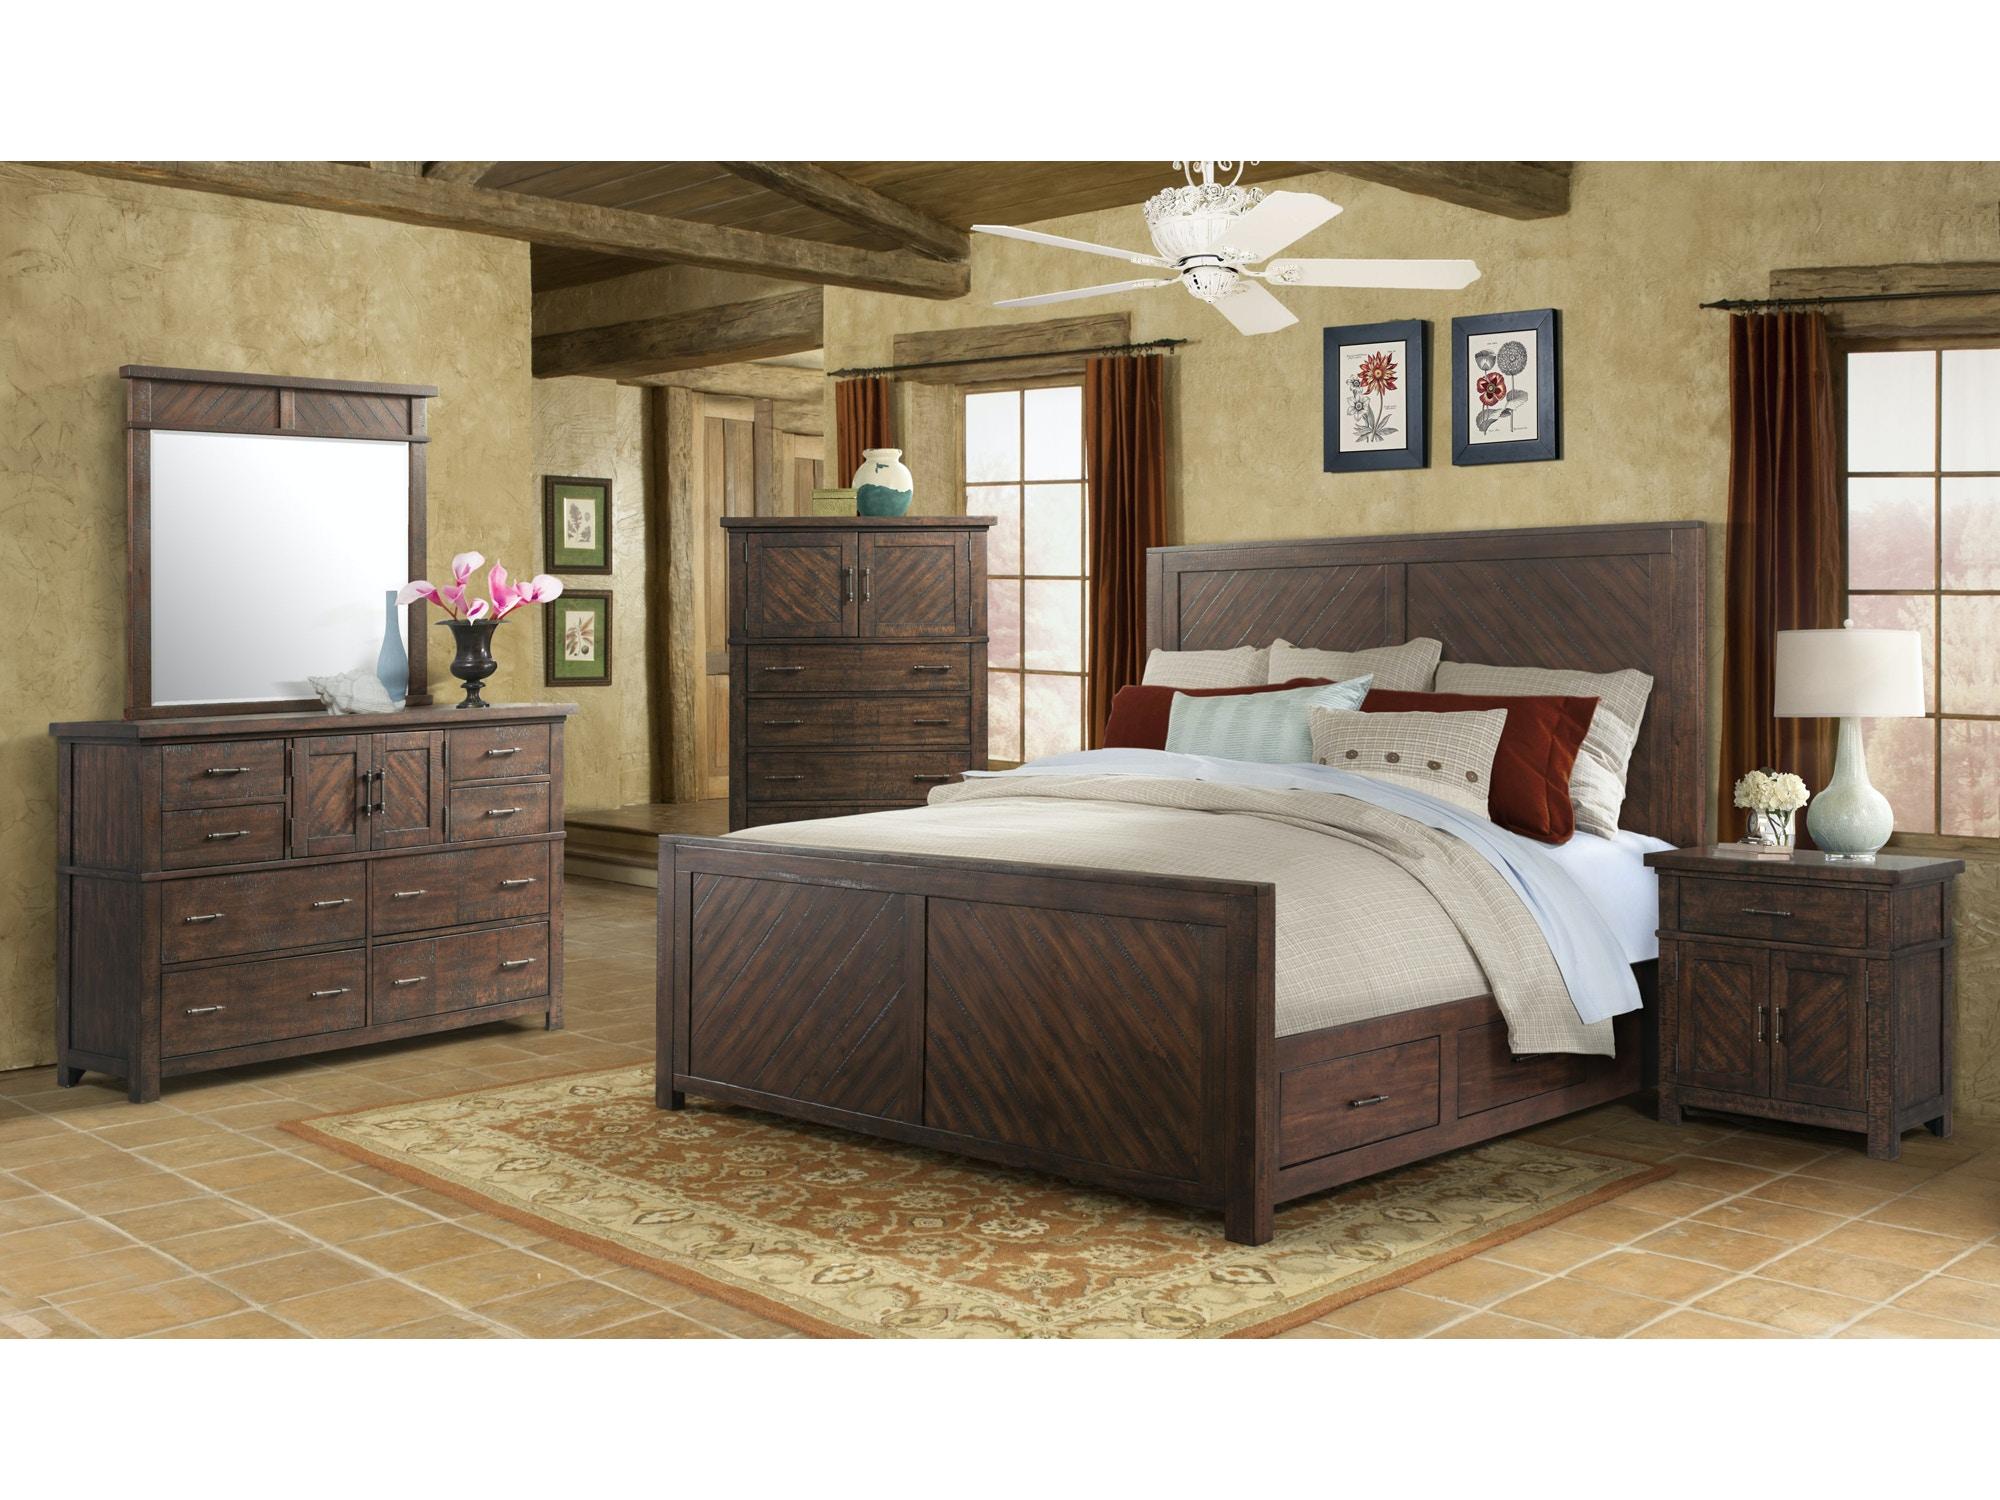 Elements International Bedroom Master Bedroom Sets Furniture - Furniture fair bedroom sets